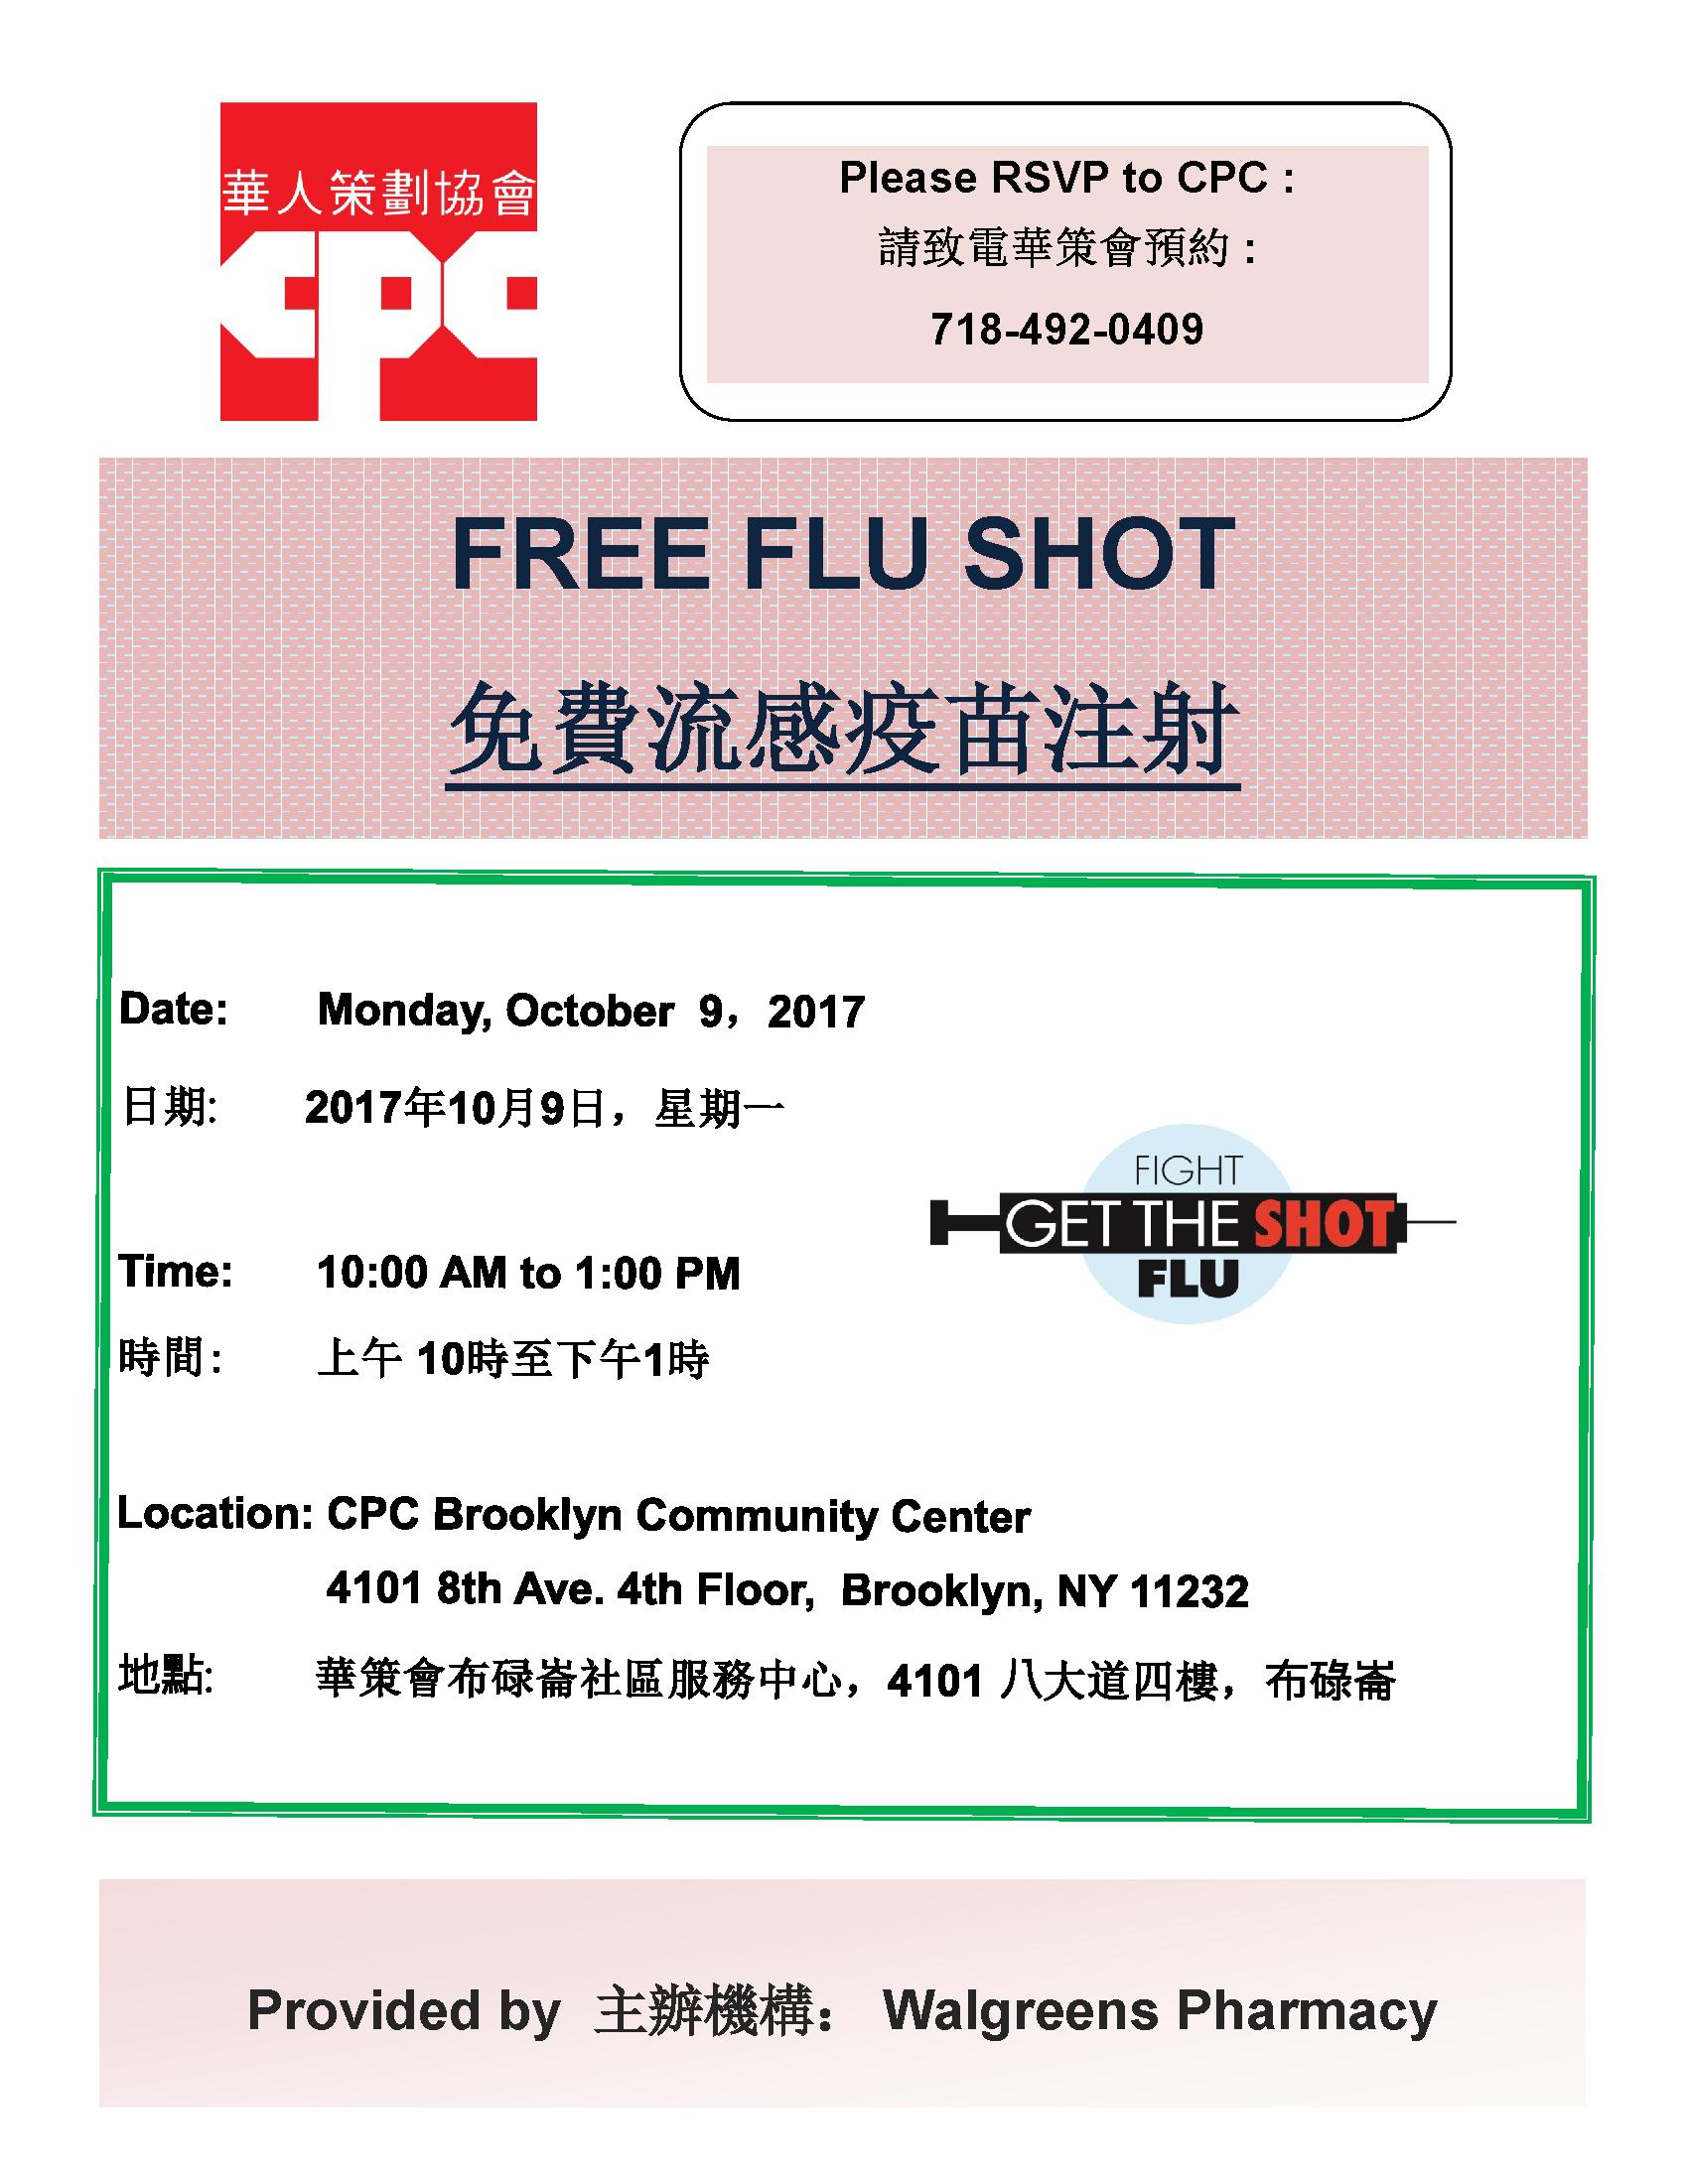 Flu Vaccine Flyers Free: CPC Brooklyn Community Services Flu Shot Clinic